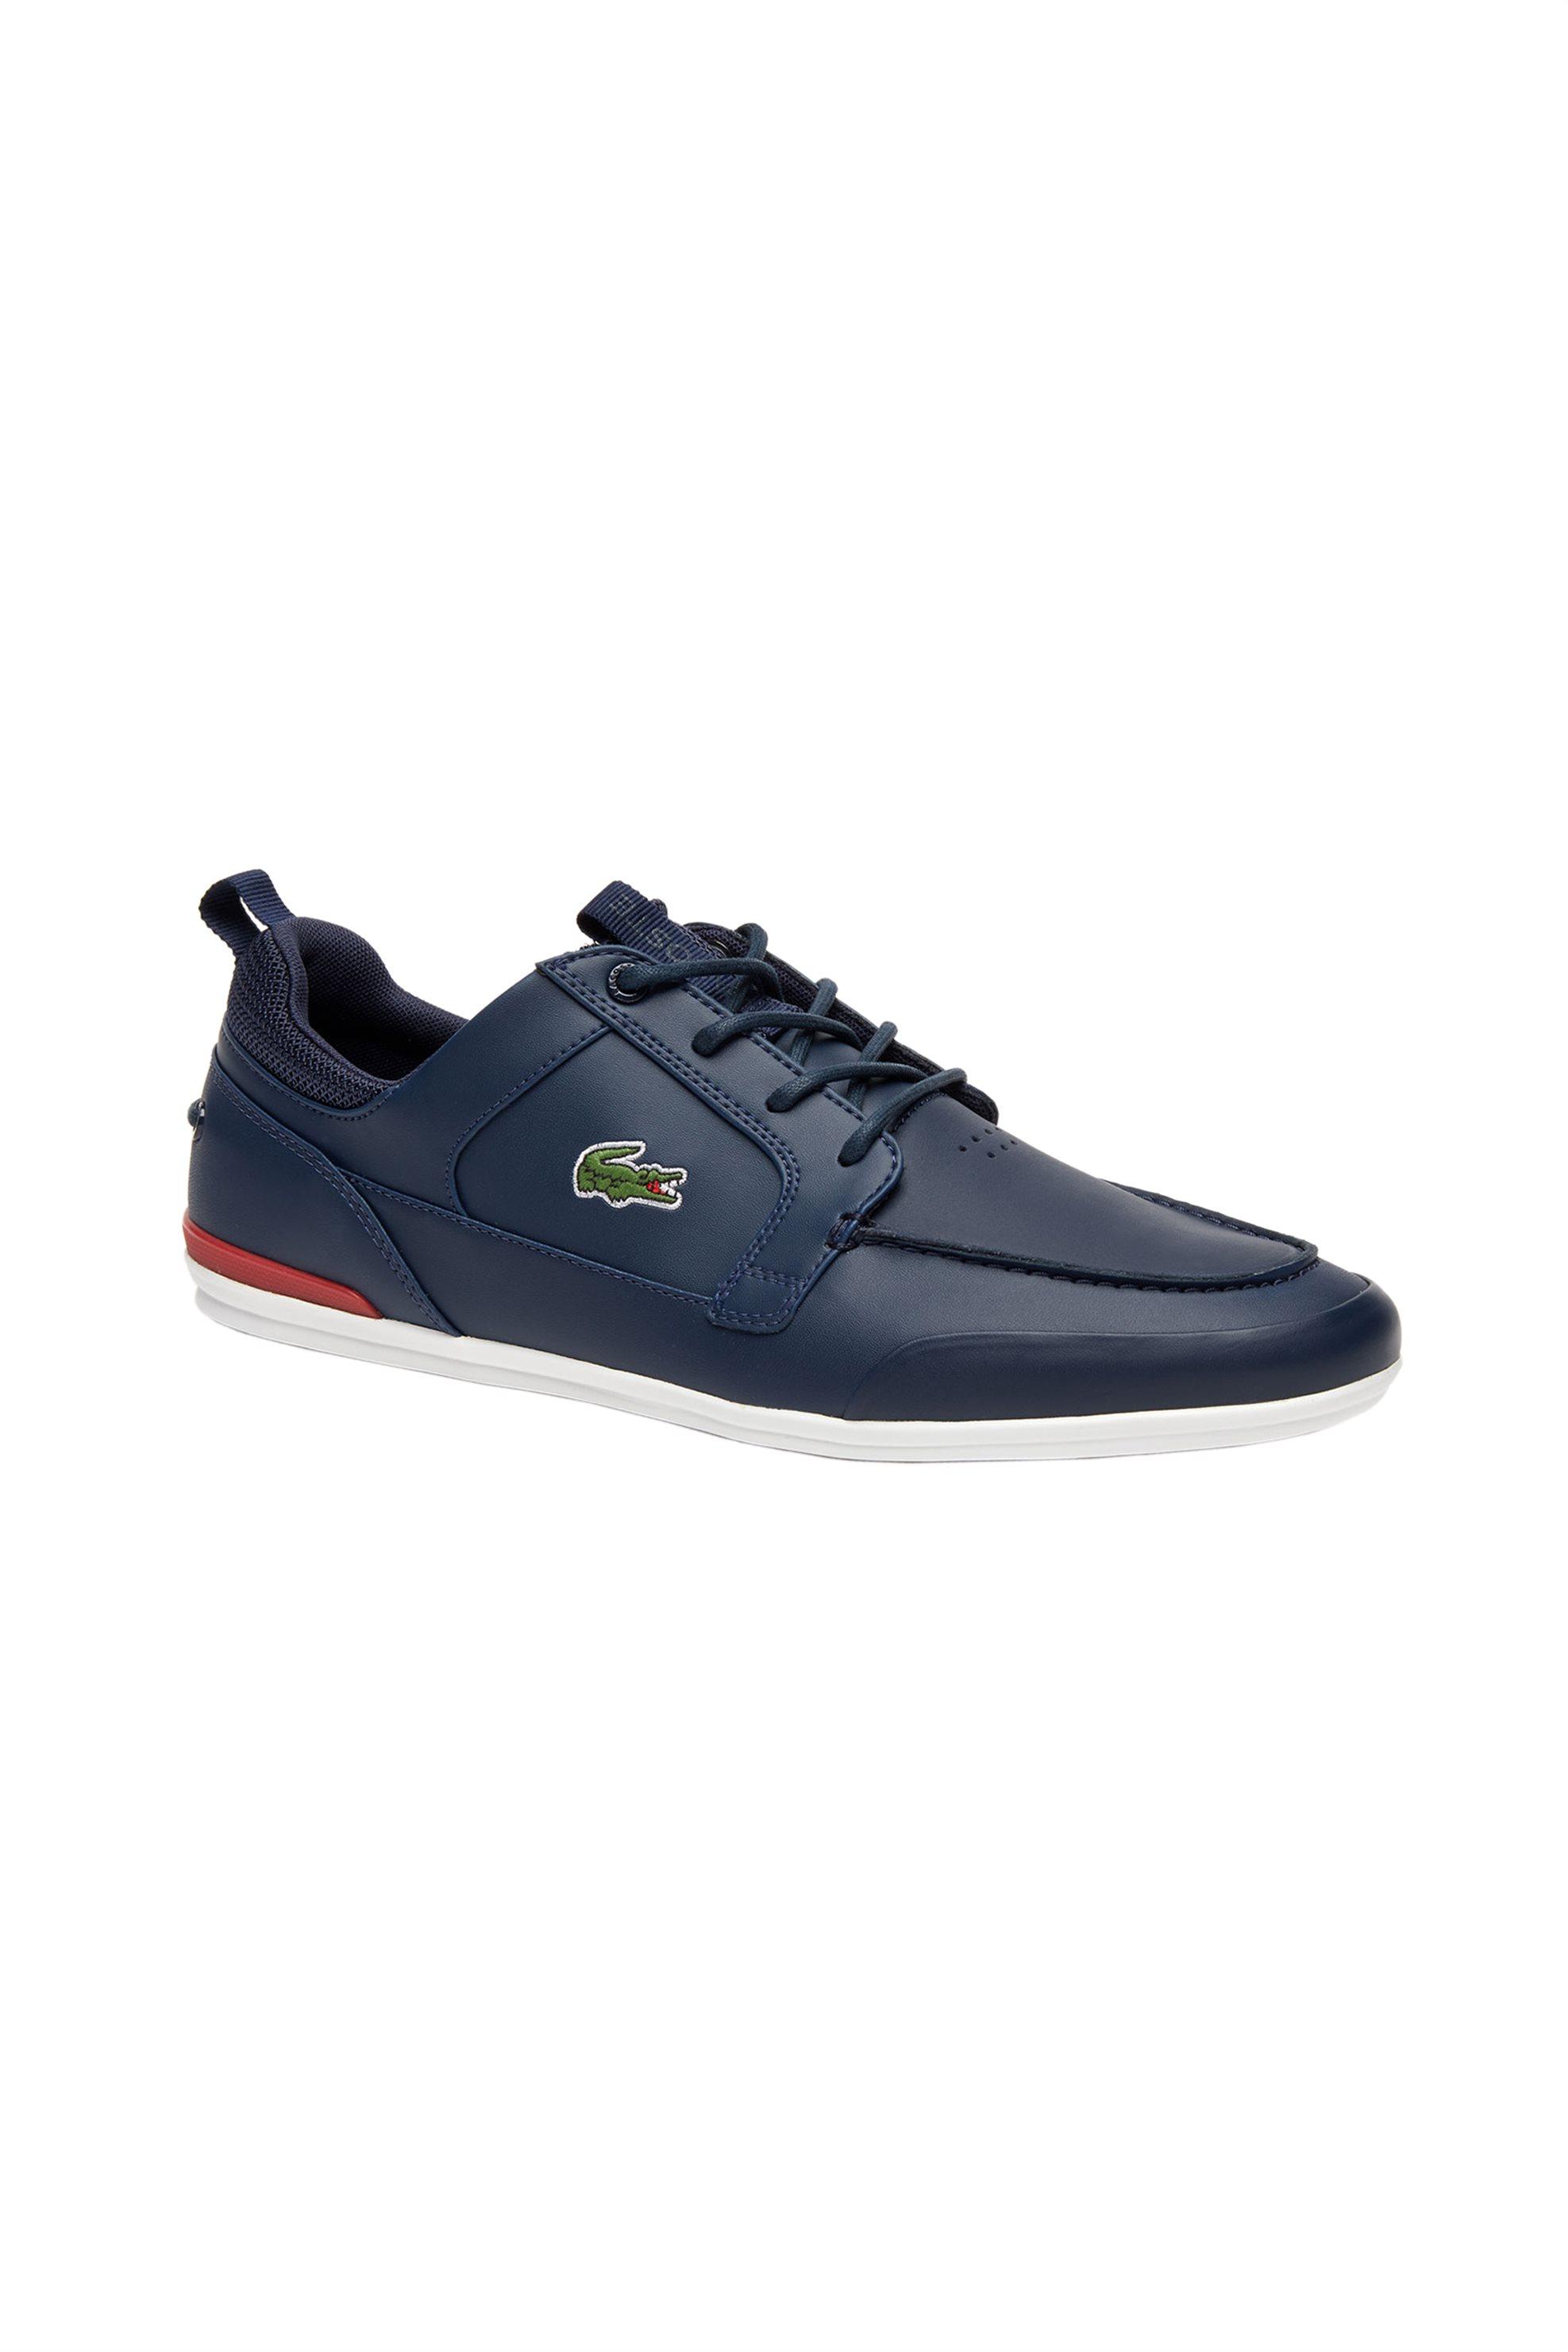 b41d9566c546 Notos Lacoste ανδρικά παπούτσια boat Marina – 37CMA0052144 – Μπλε Σκούρο